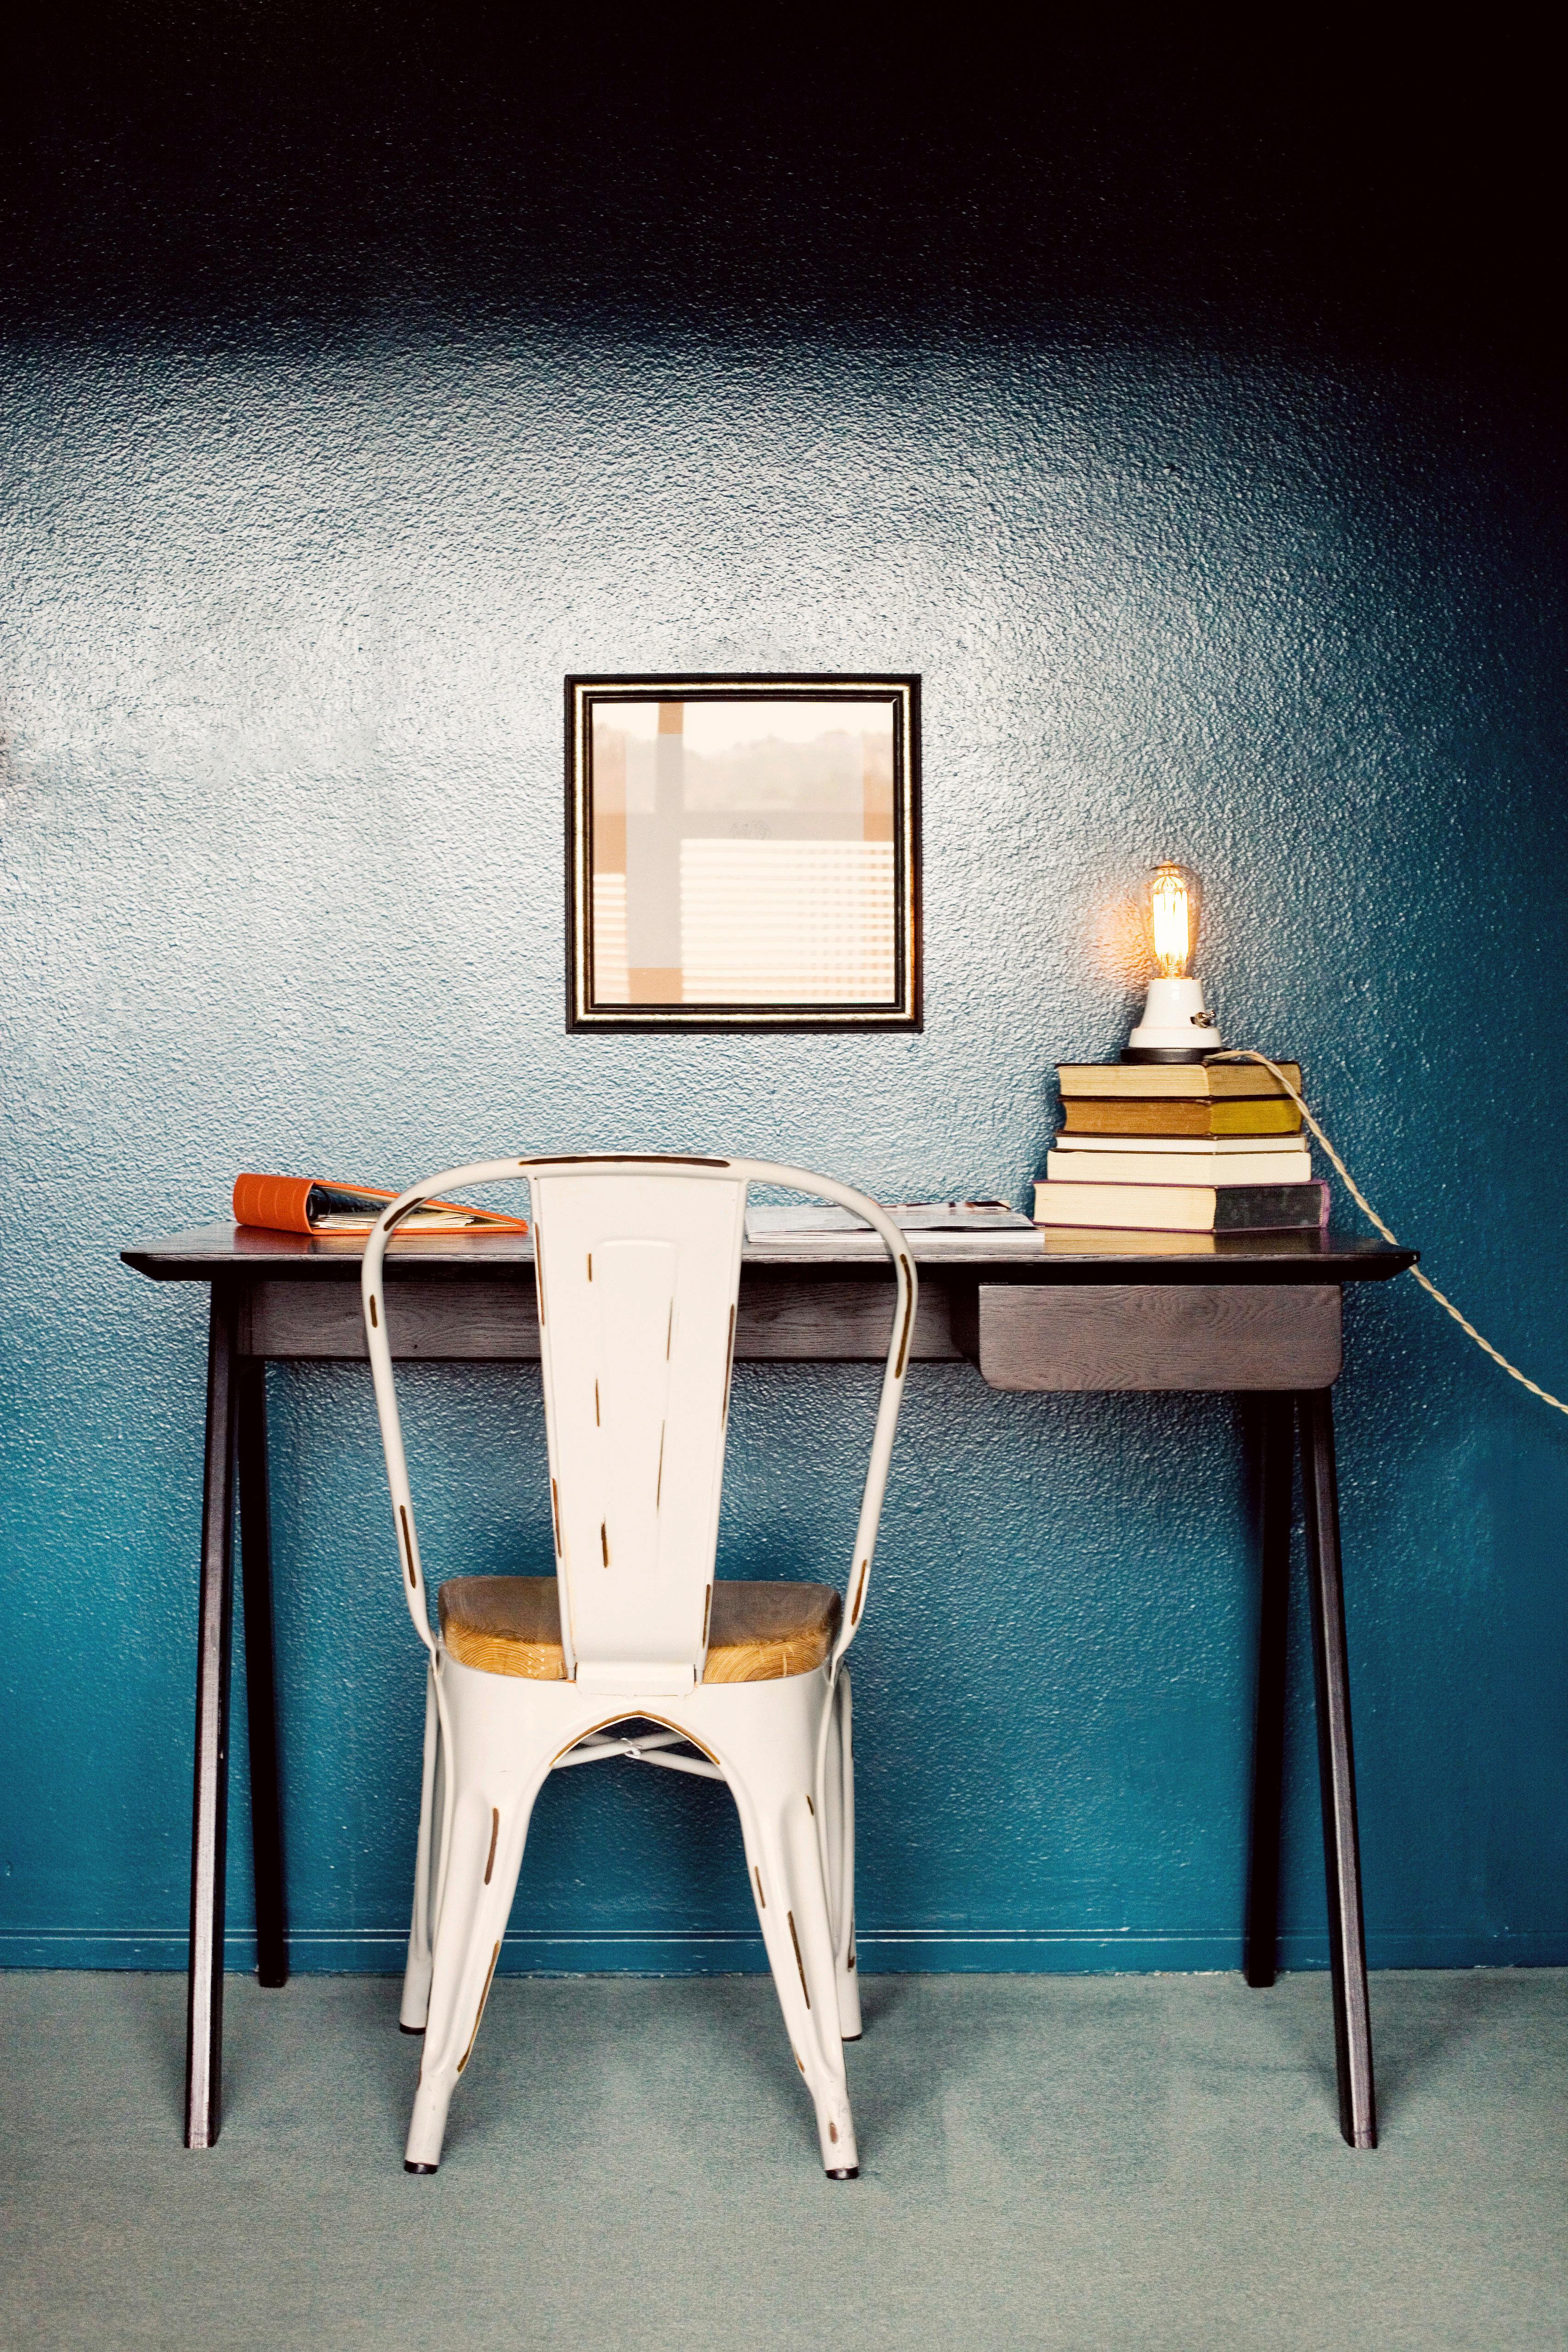 Boutique Business City Hip Lounge Modern desk chair lighting